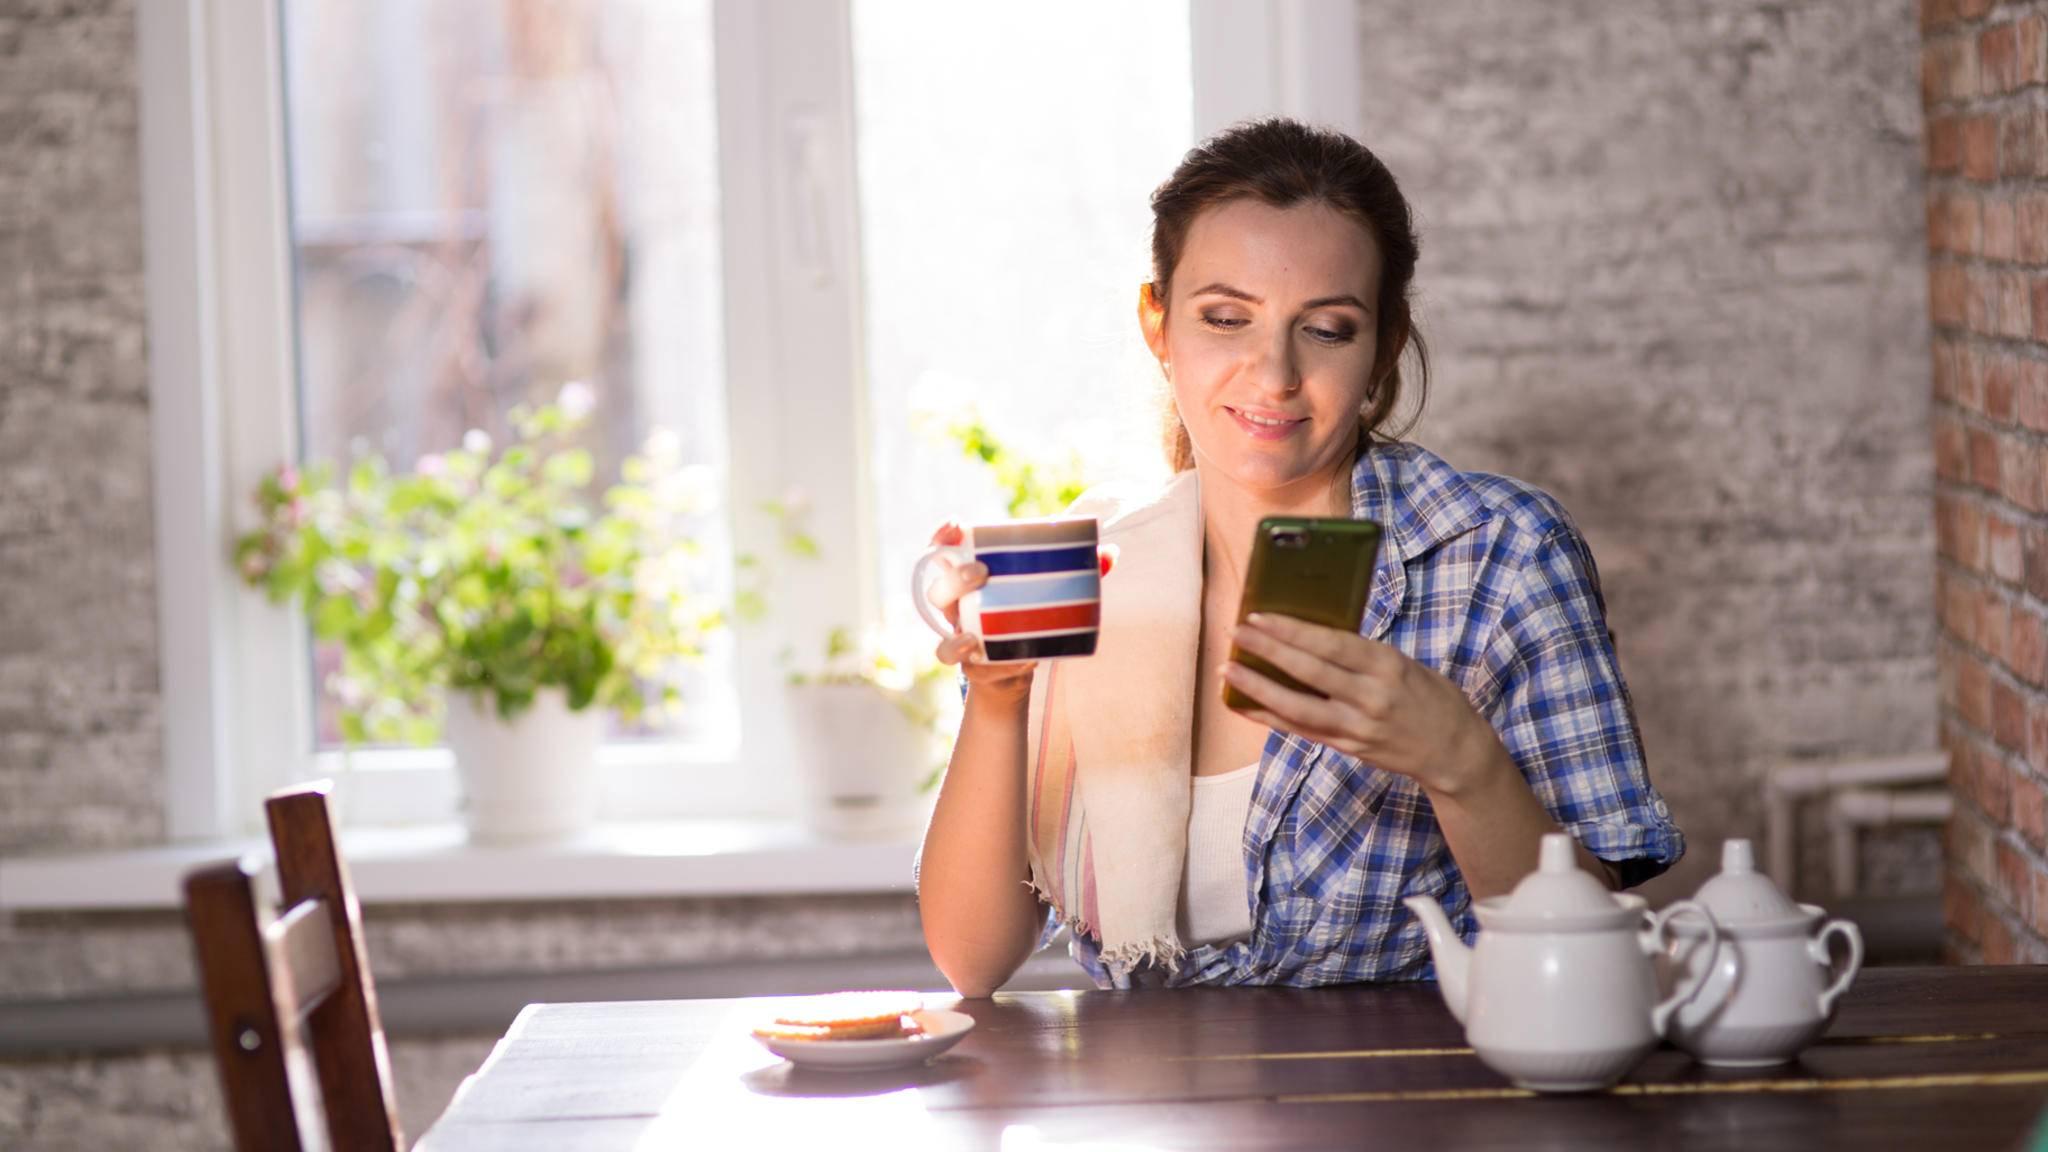 Frau Küche Kaffee Smartphone